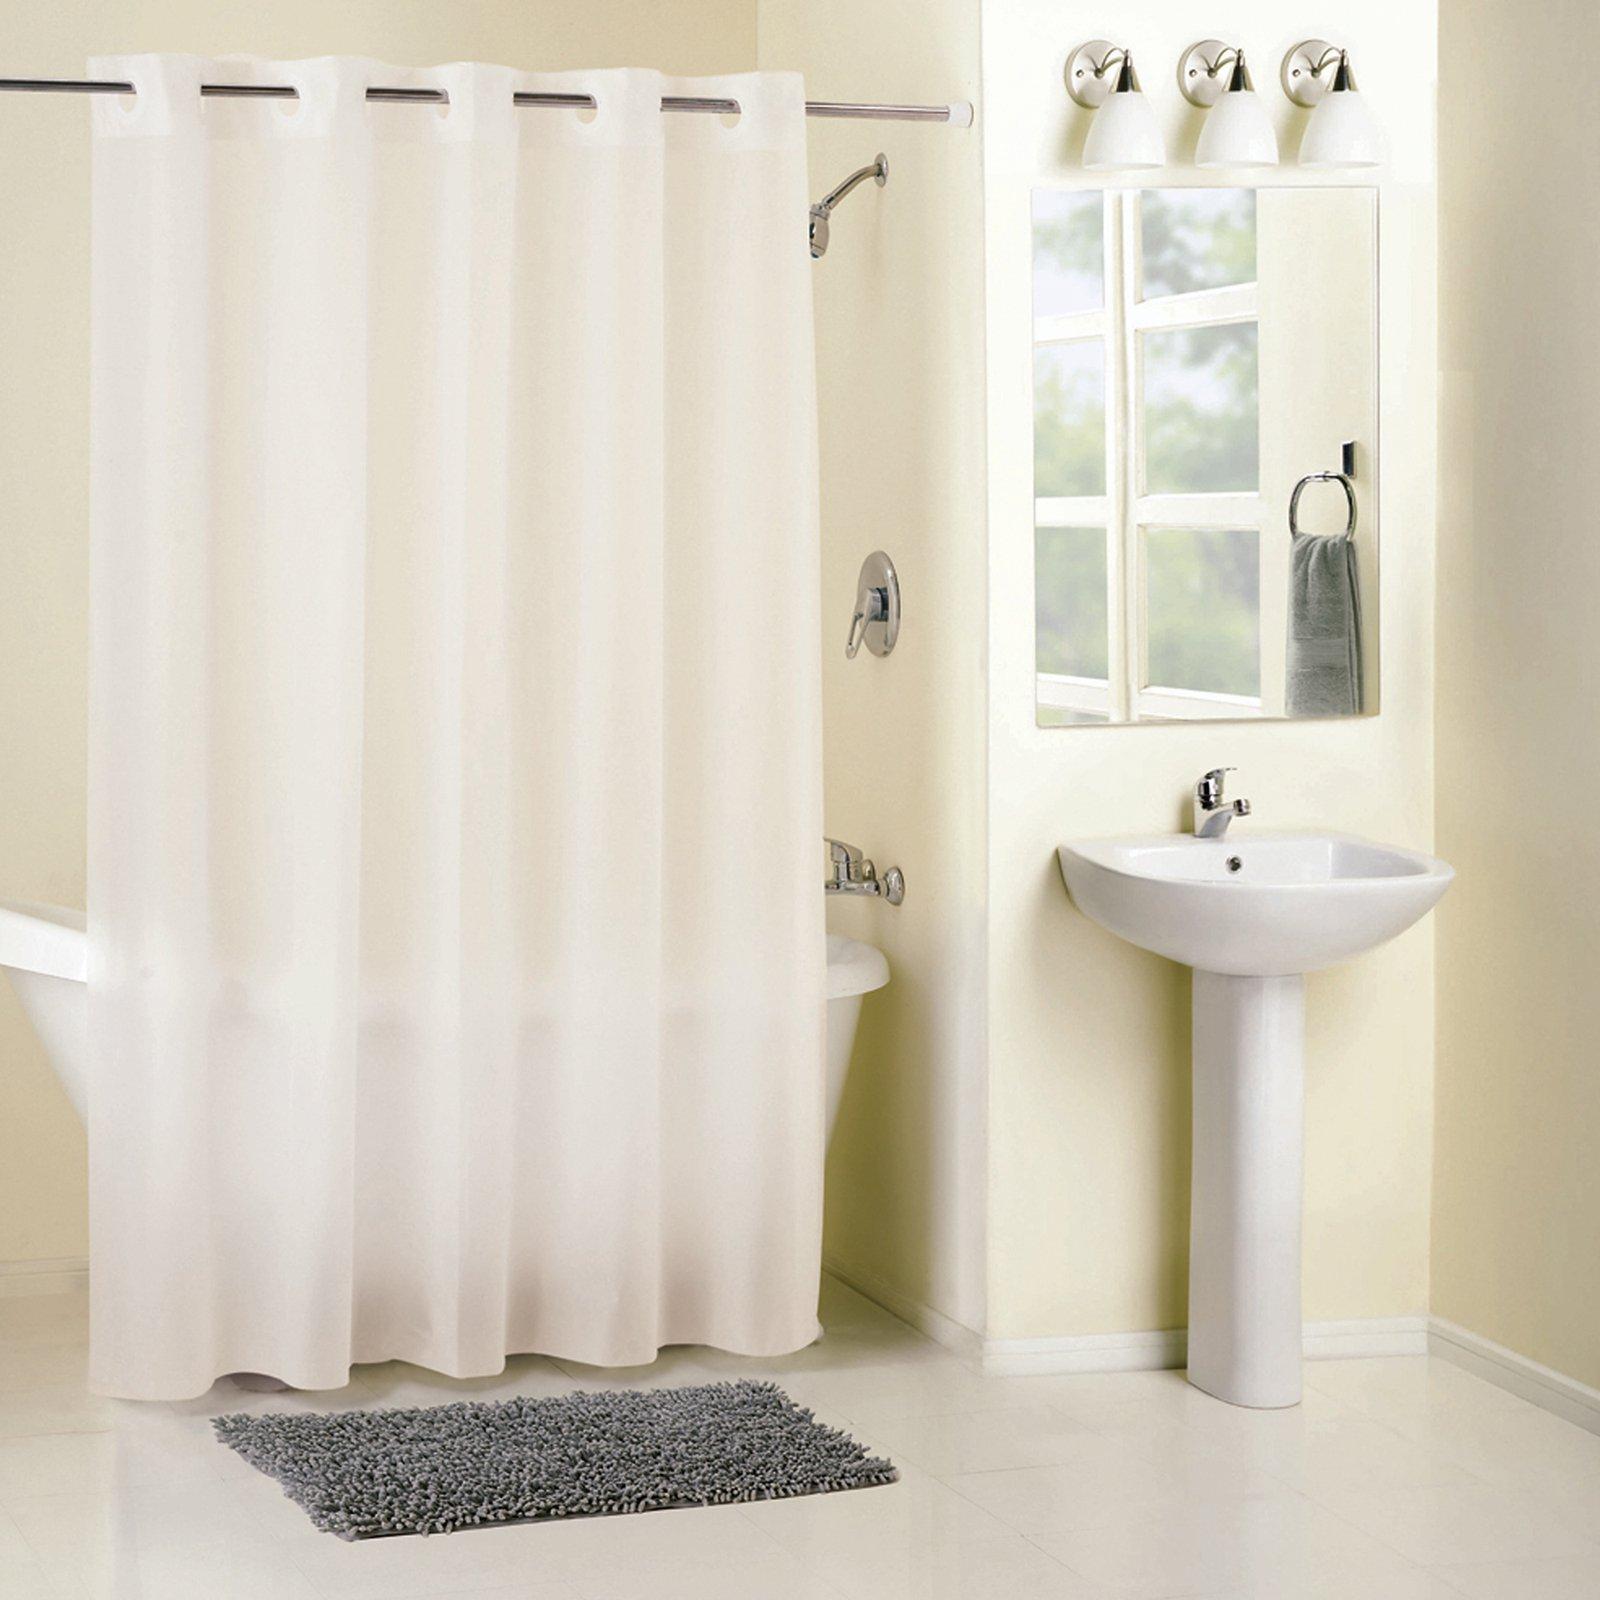 Kohls Shower Curtains